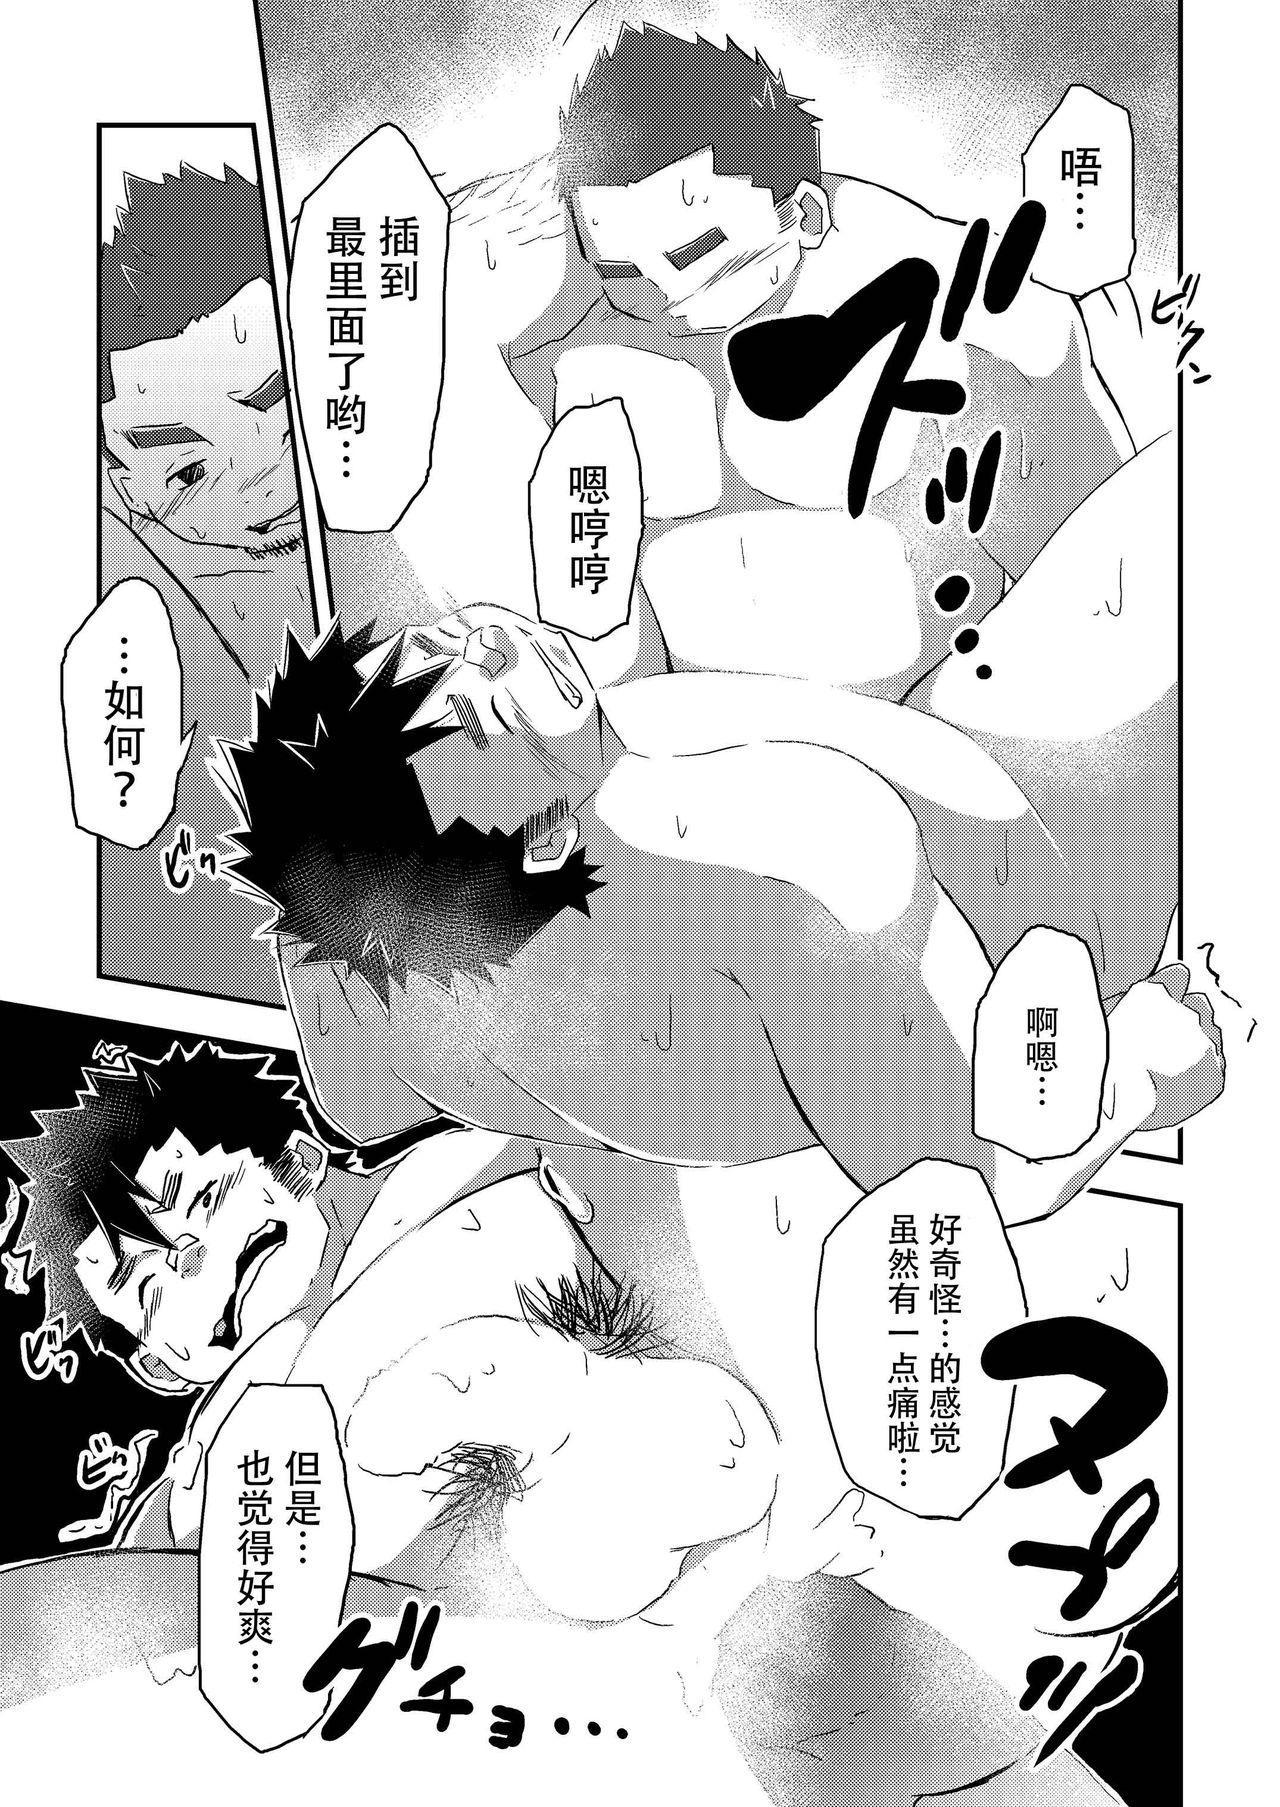 [CorkBOX (ngng)] Ise-kun wa Tamatte Iru. - Ise-kun is horny. [Chinese] {日曜日汉化} [Digital] 21